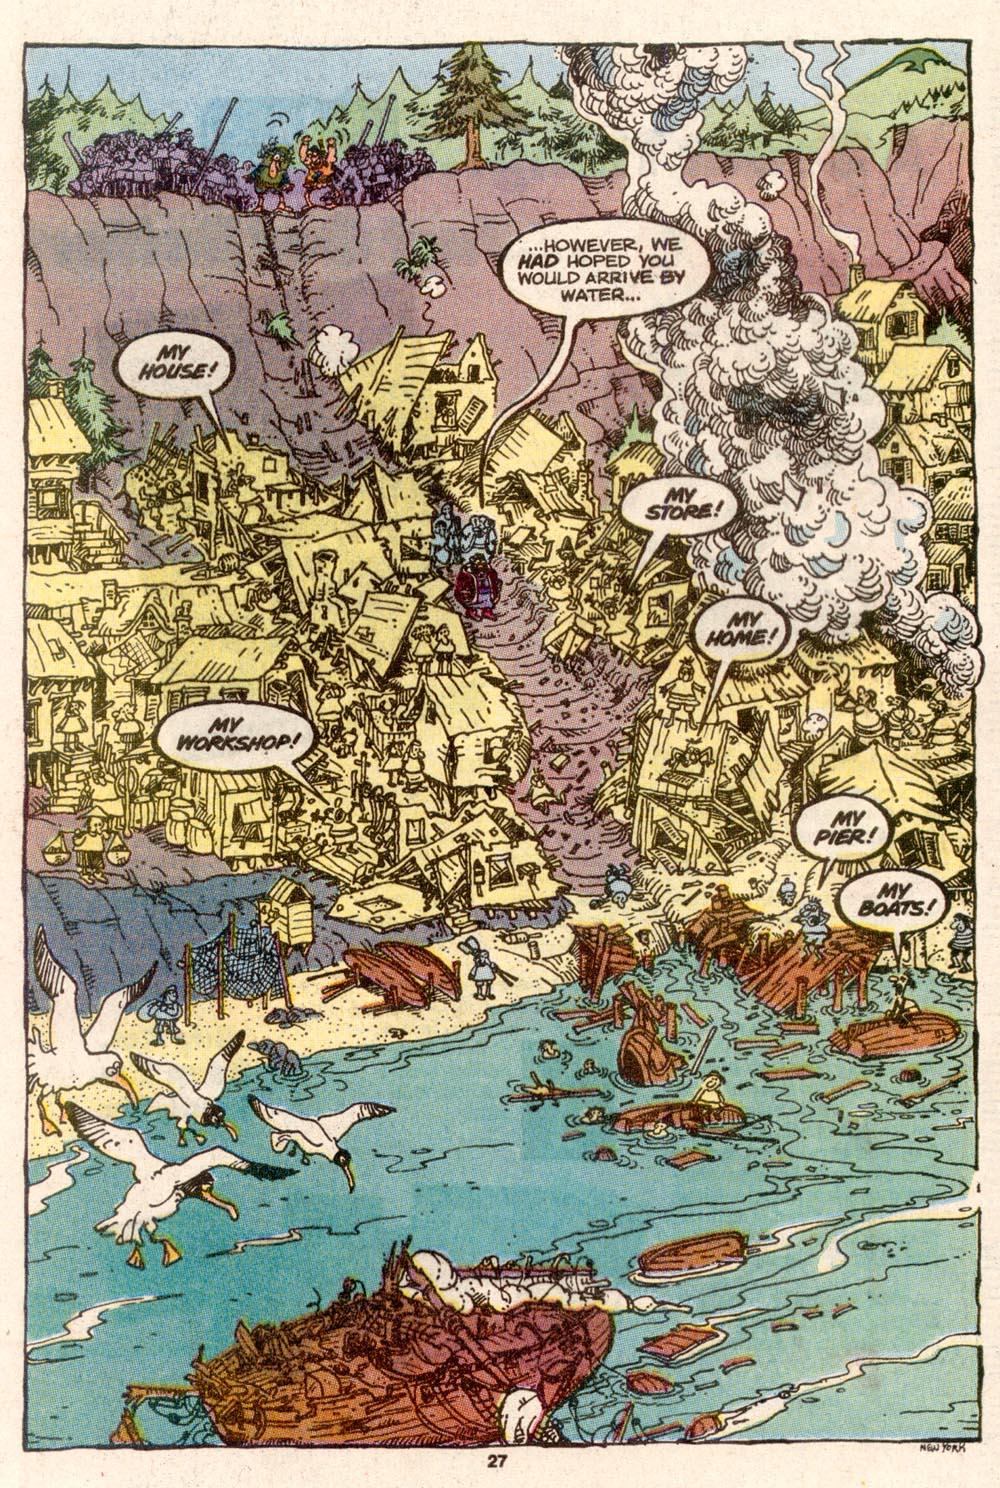 Read online Sergio Aragonés Groo the Wanderer comic -  Issue #69 - 22